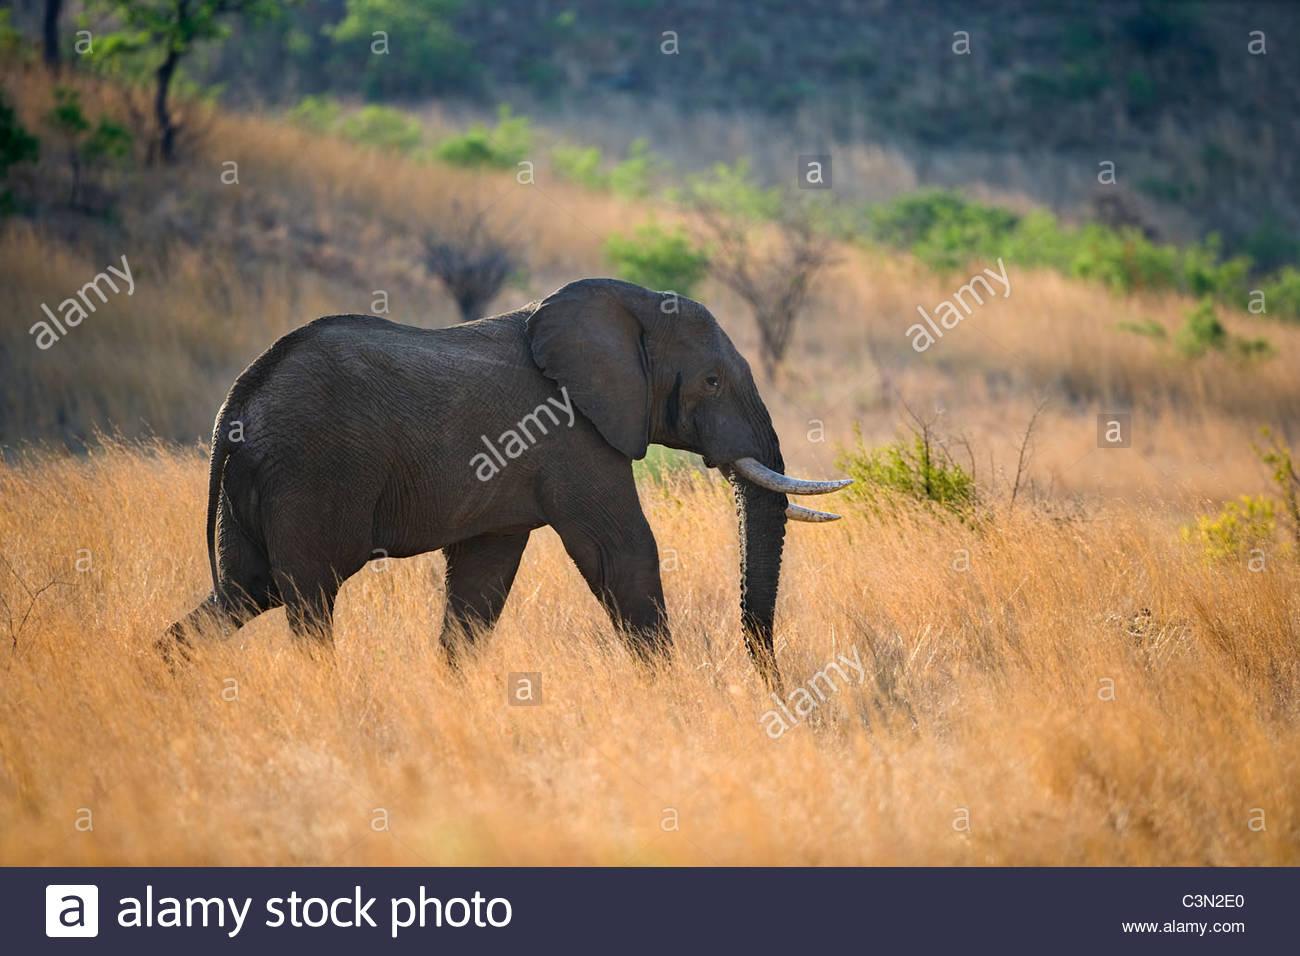 South Africa, near Rustenburg, Pilanesberg National Park. African Elephant, Loxodonta africana. Male in musk. - Stock Image